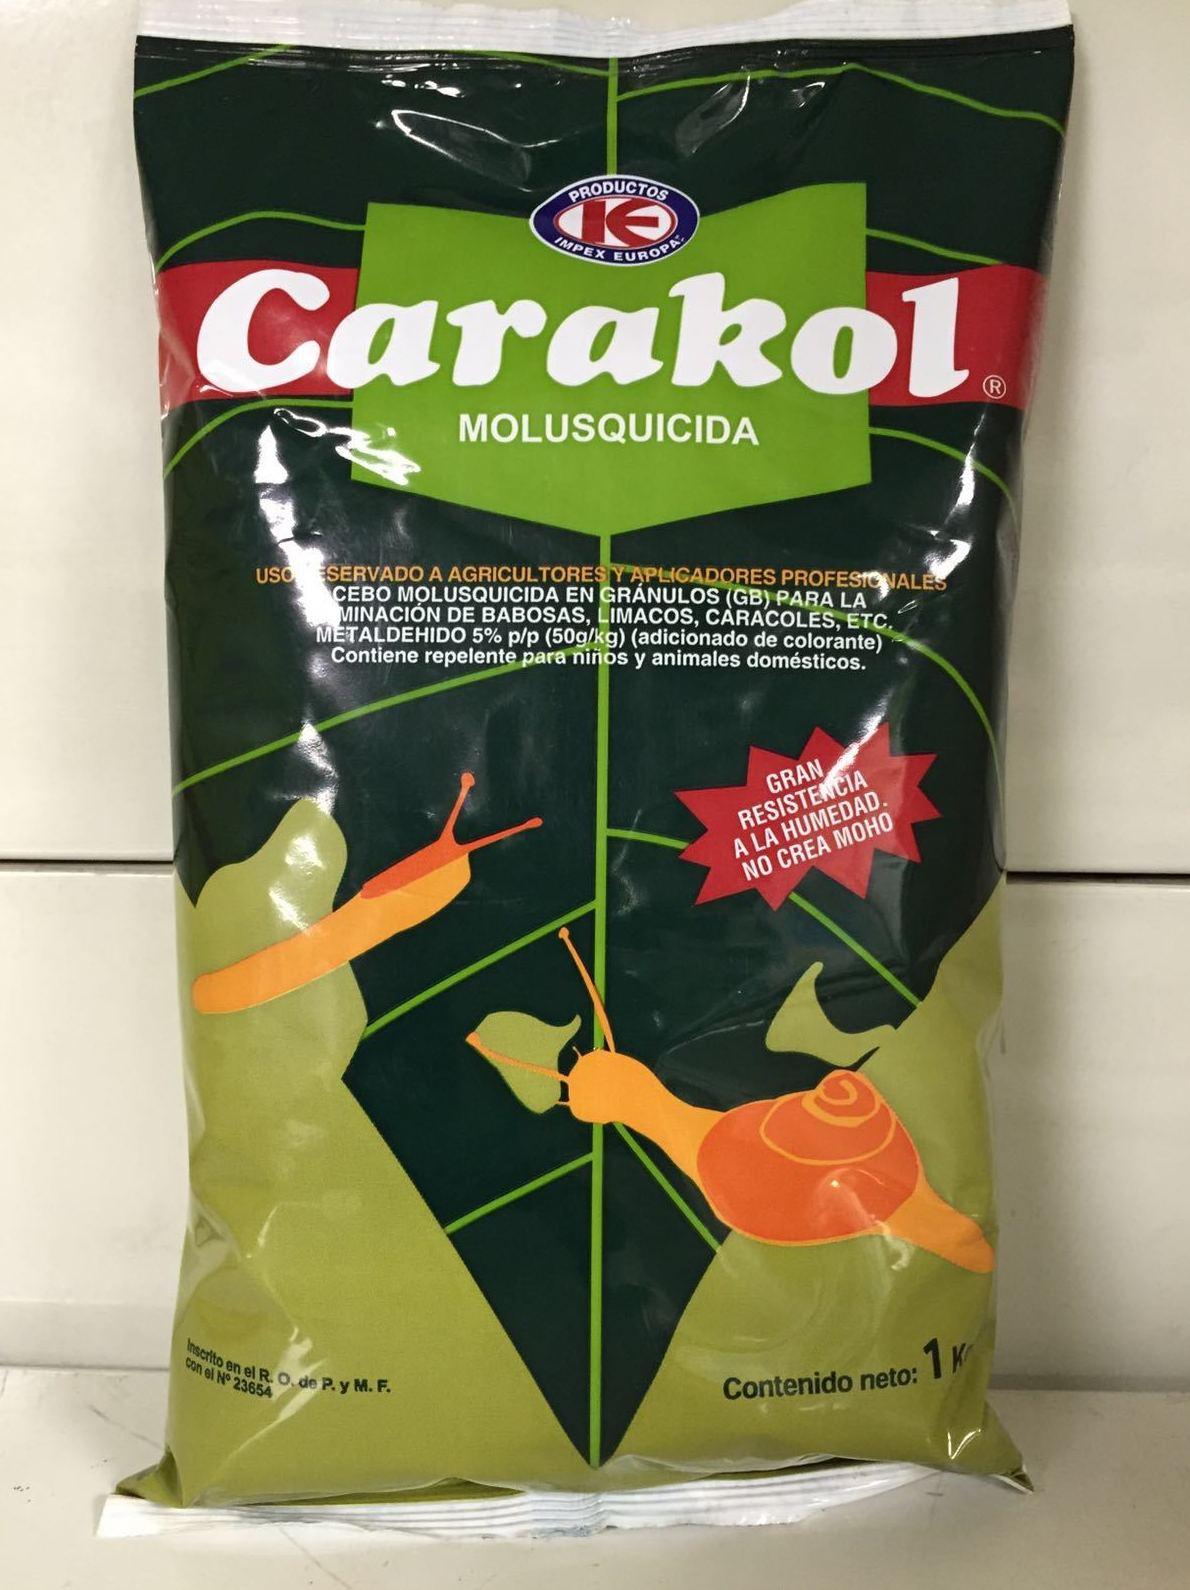 Pesticidas para combatir plagas de caracoles